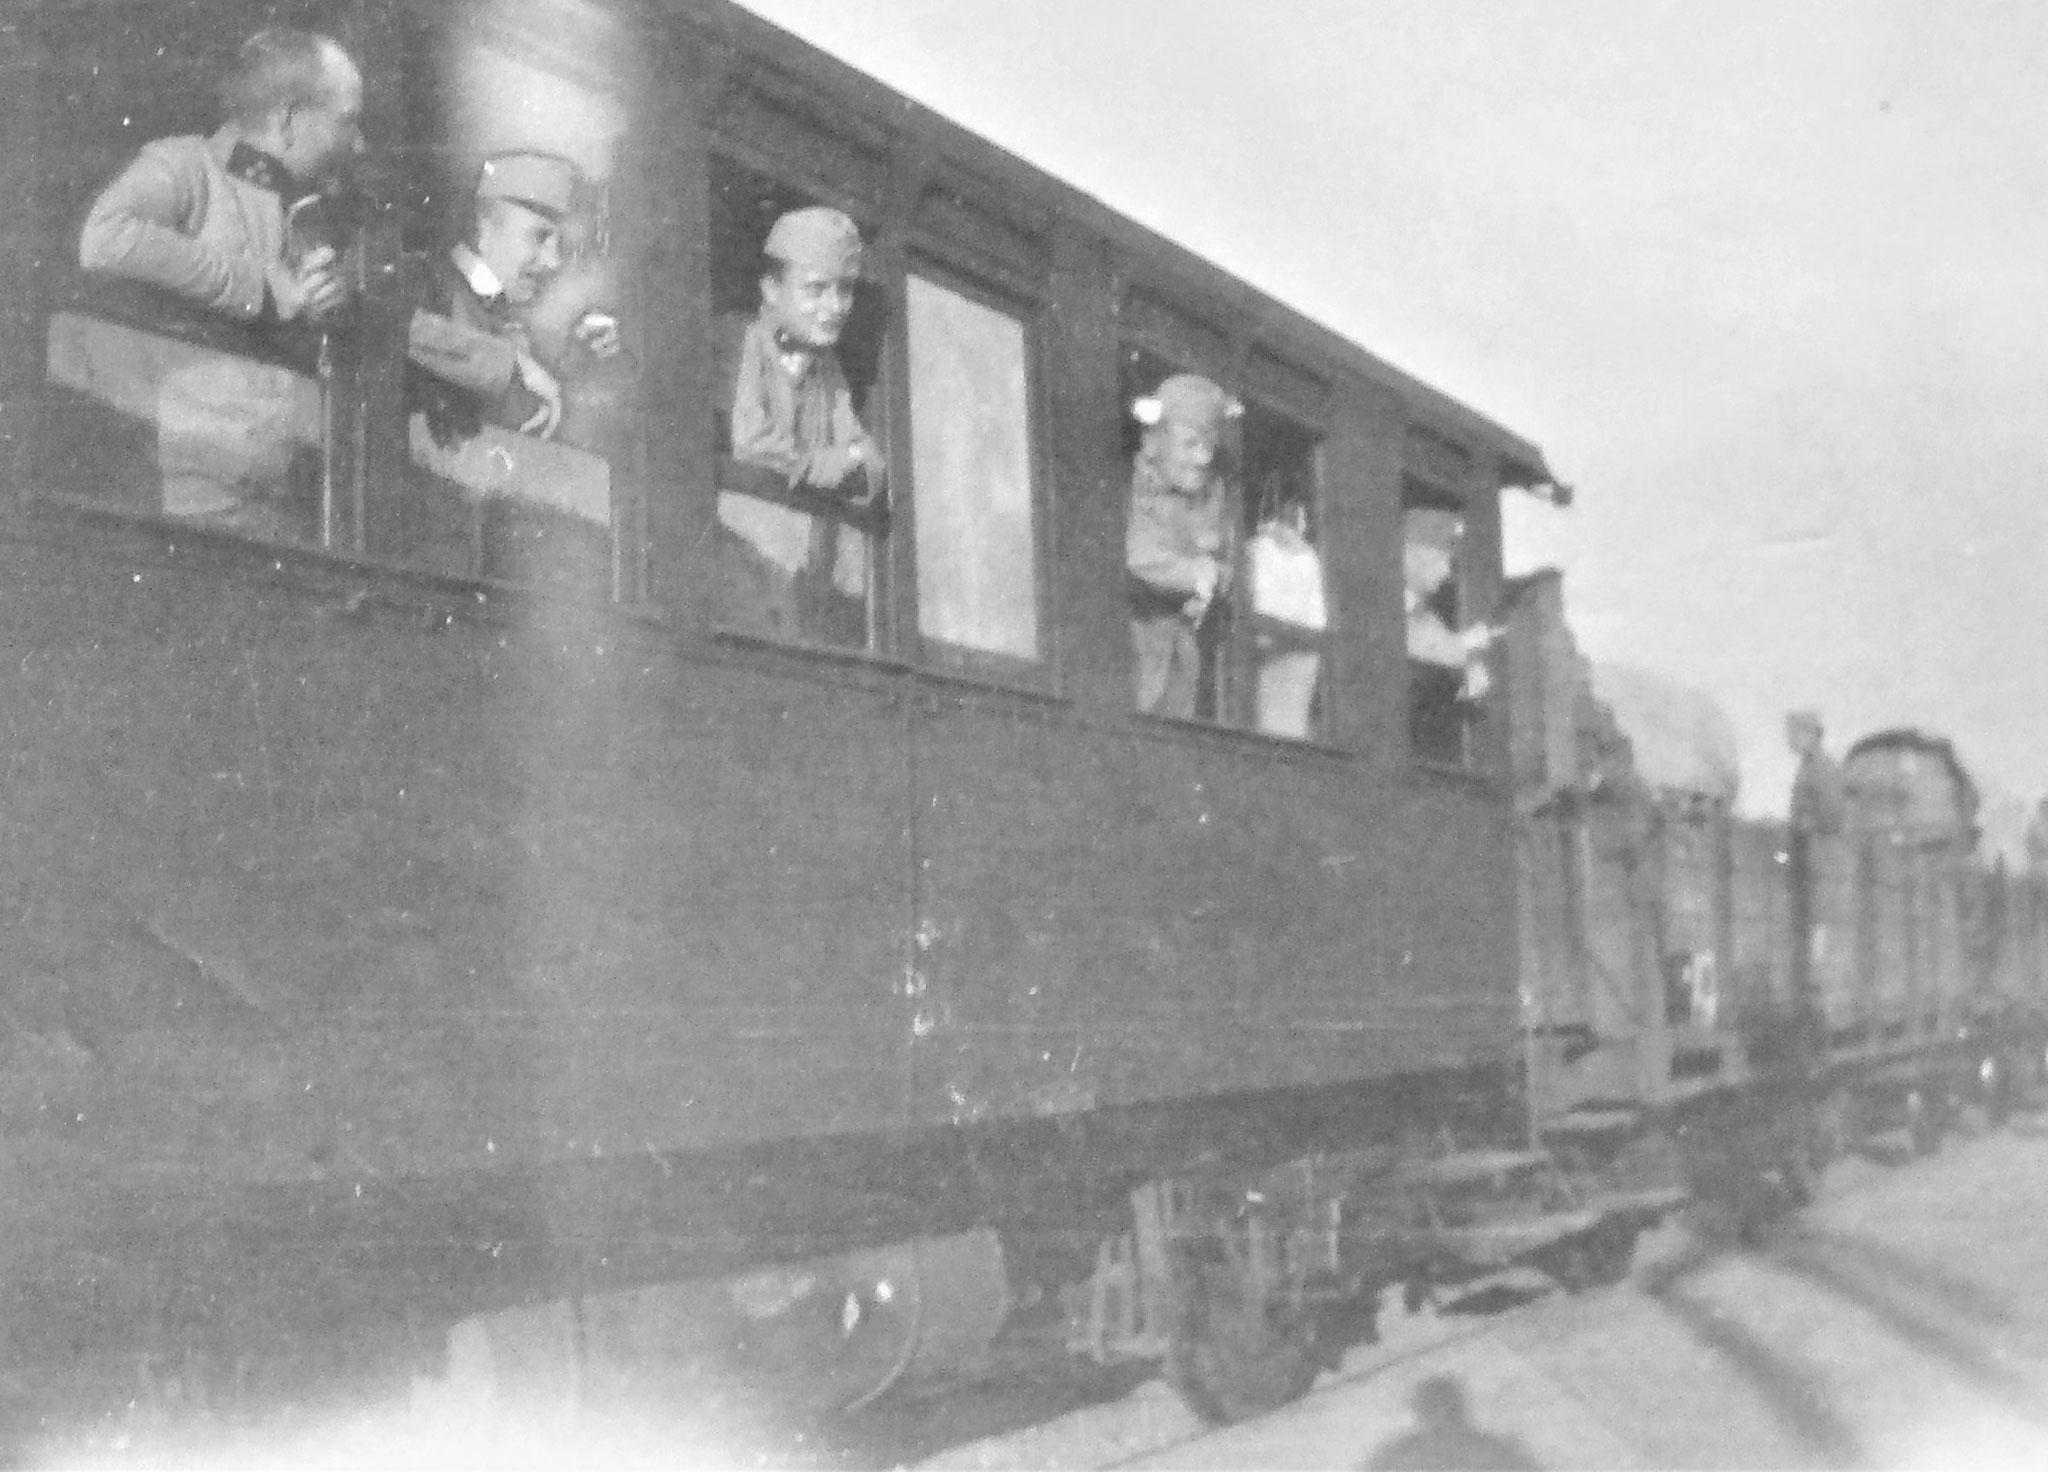 Kolbe, Uram, Polak, ich, Kranz.- Hinten Loris mit Trainwagen.